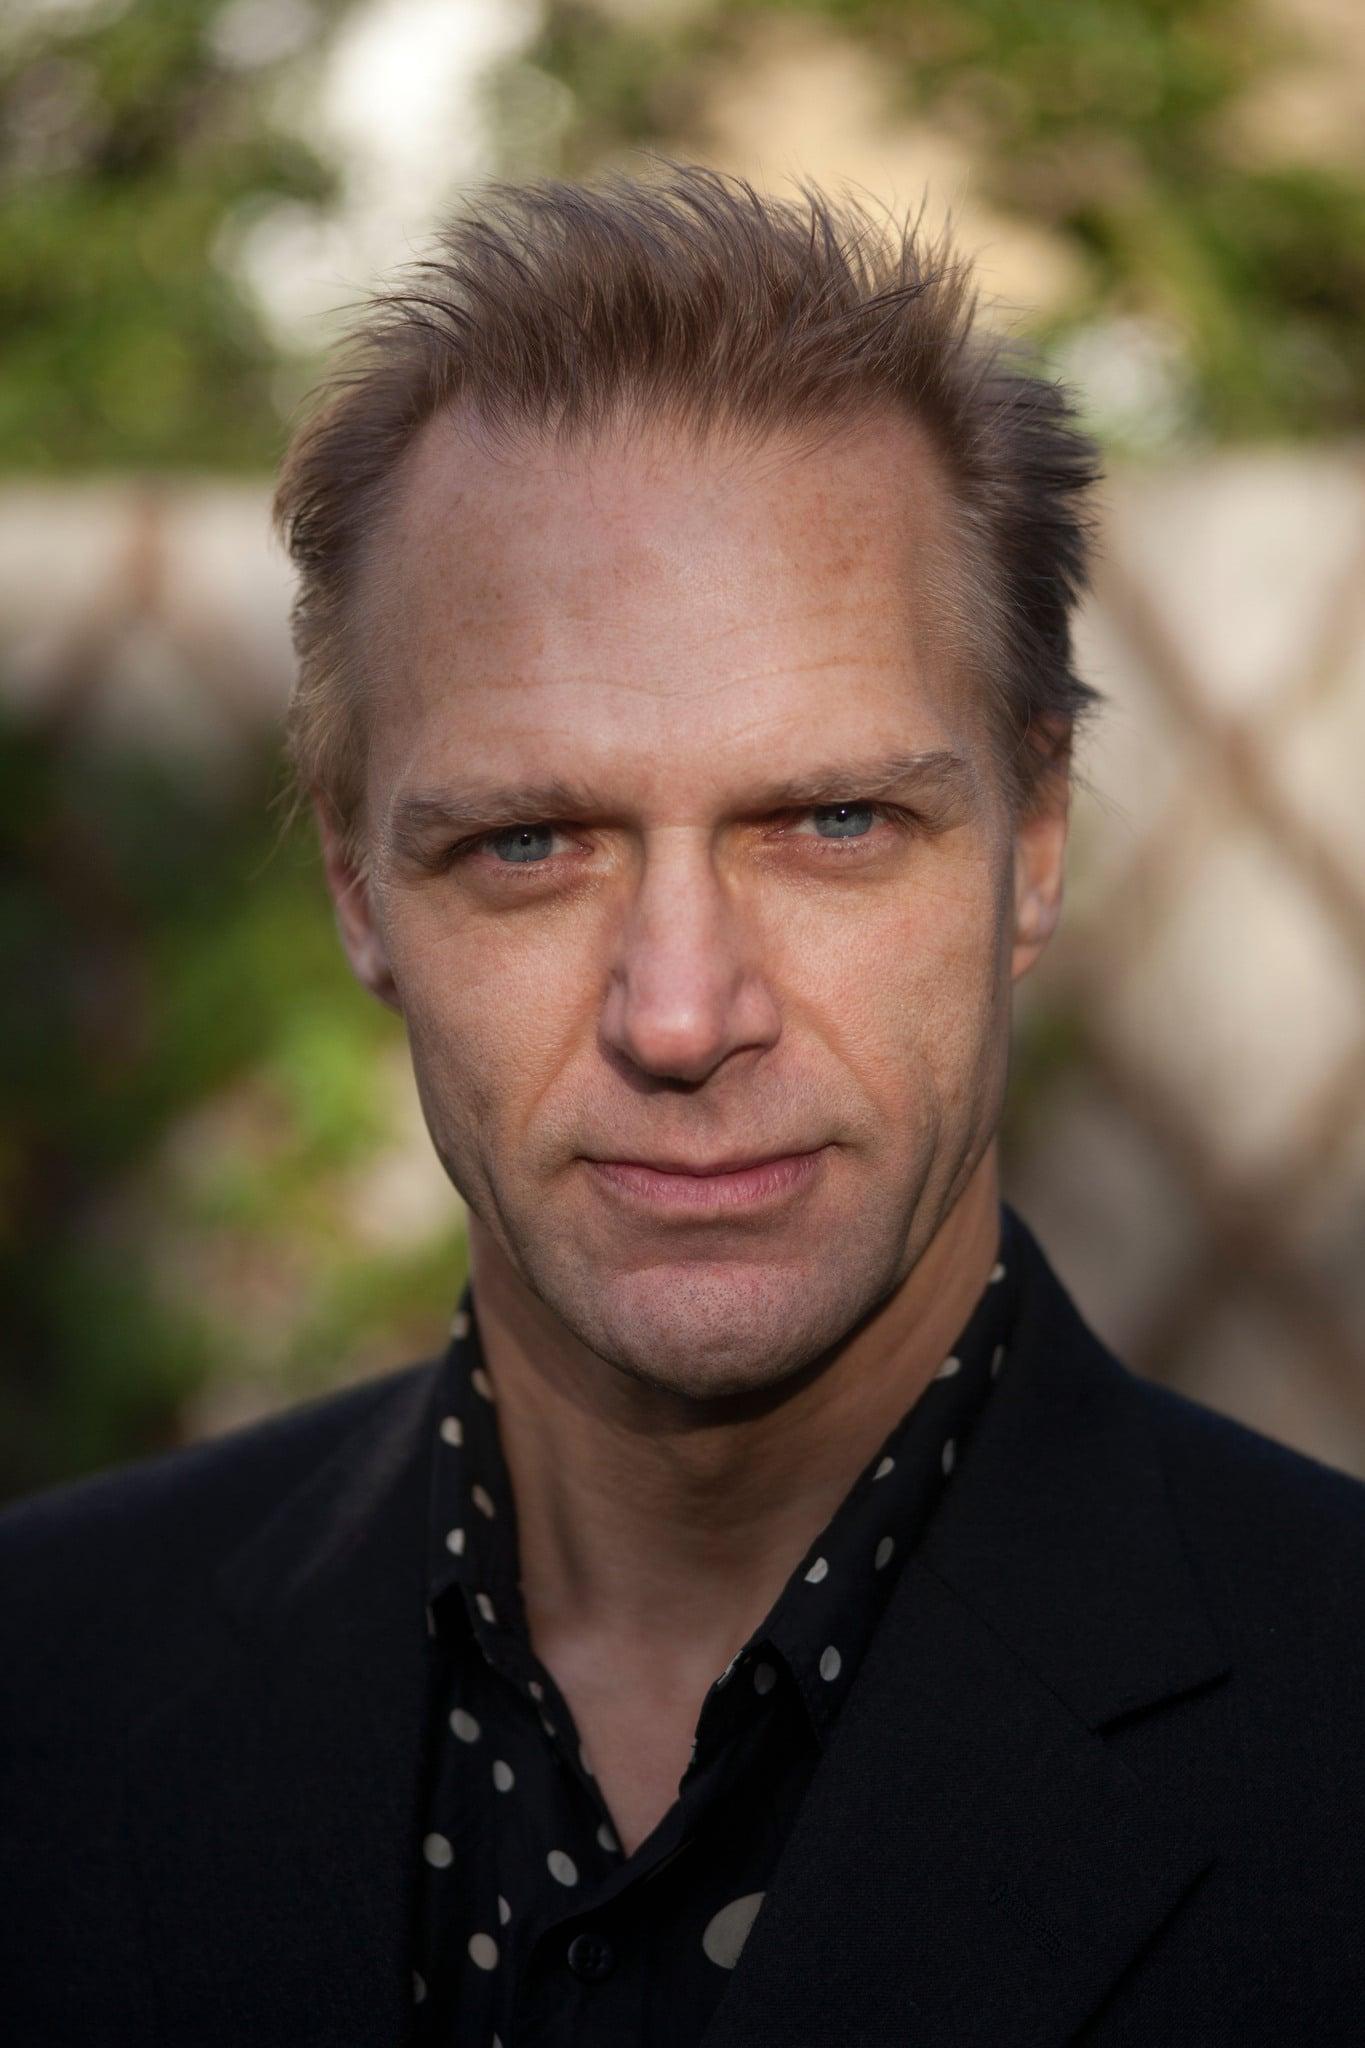 Andreas Wisniewski German Actor